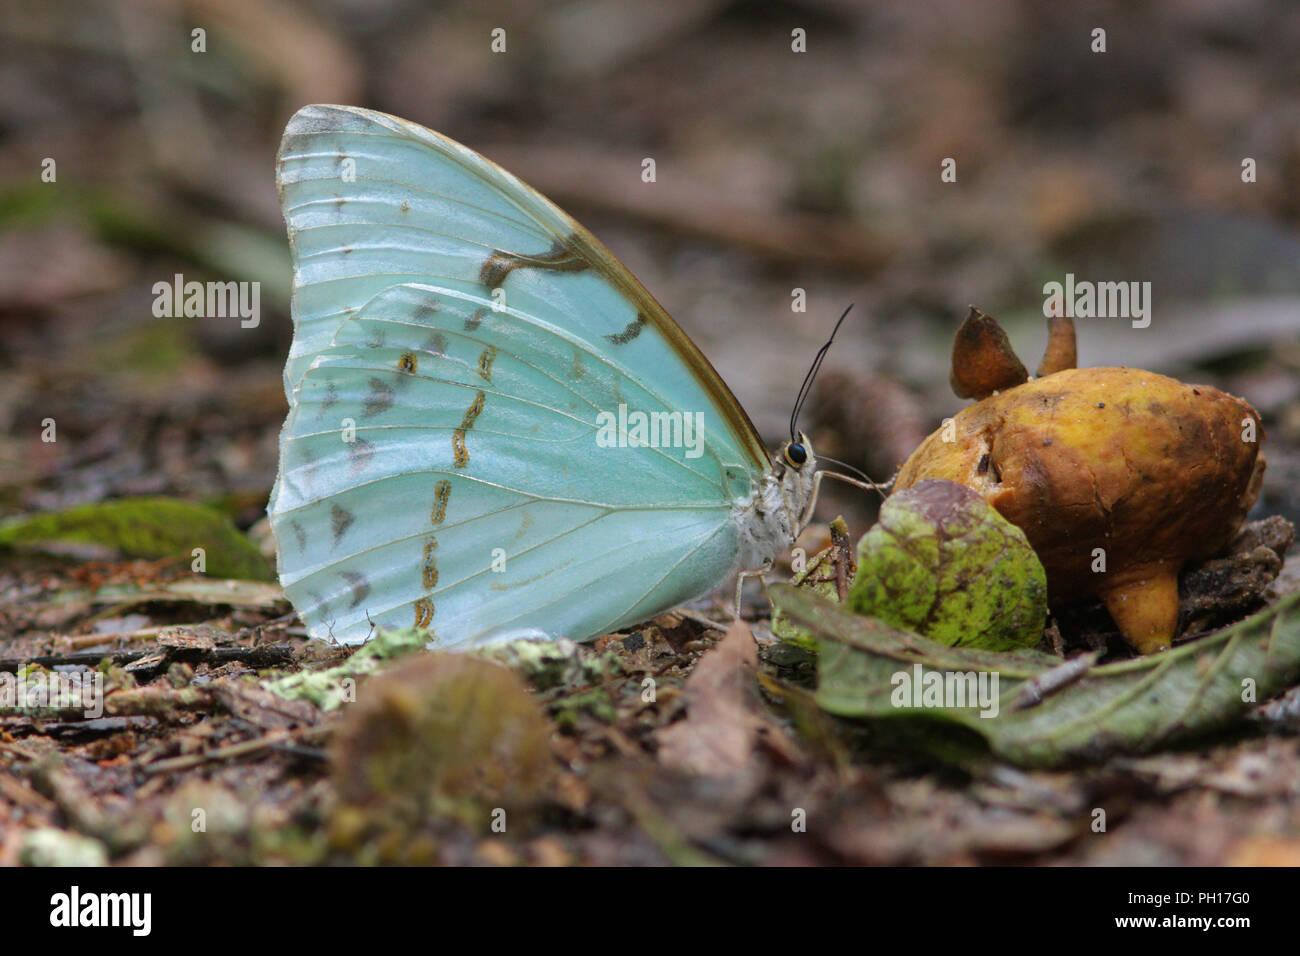 Bộ sưu tập cánh vẩy 6 - Page 5 Morpho-butterfly-morpho-laertes-single-adult-feeding-on-rotten-fruit-taken-april-atlantic-rainforest-brazil-PH17G0